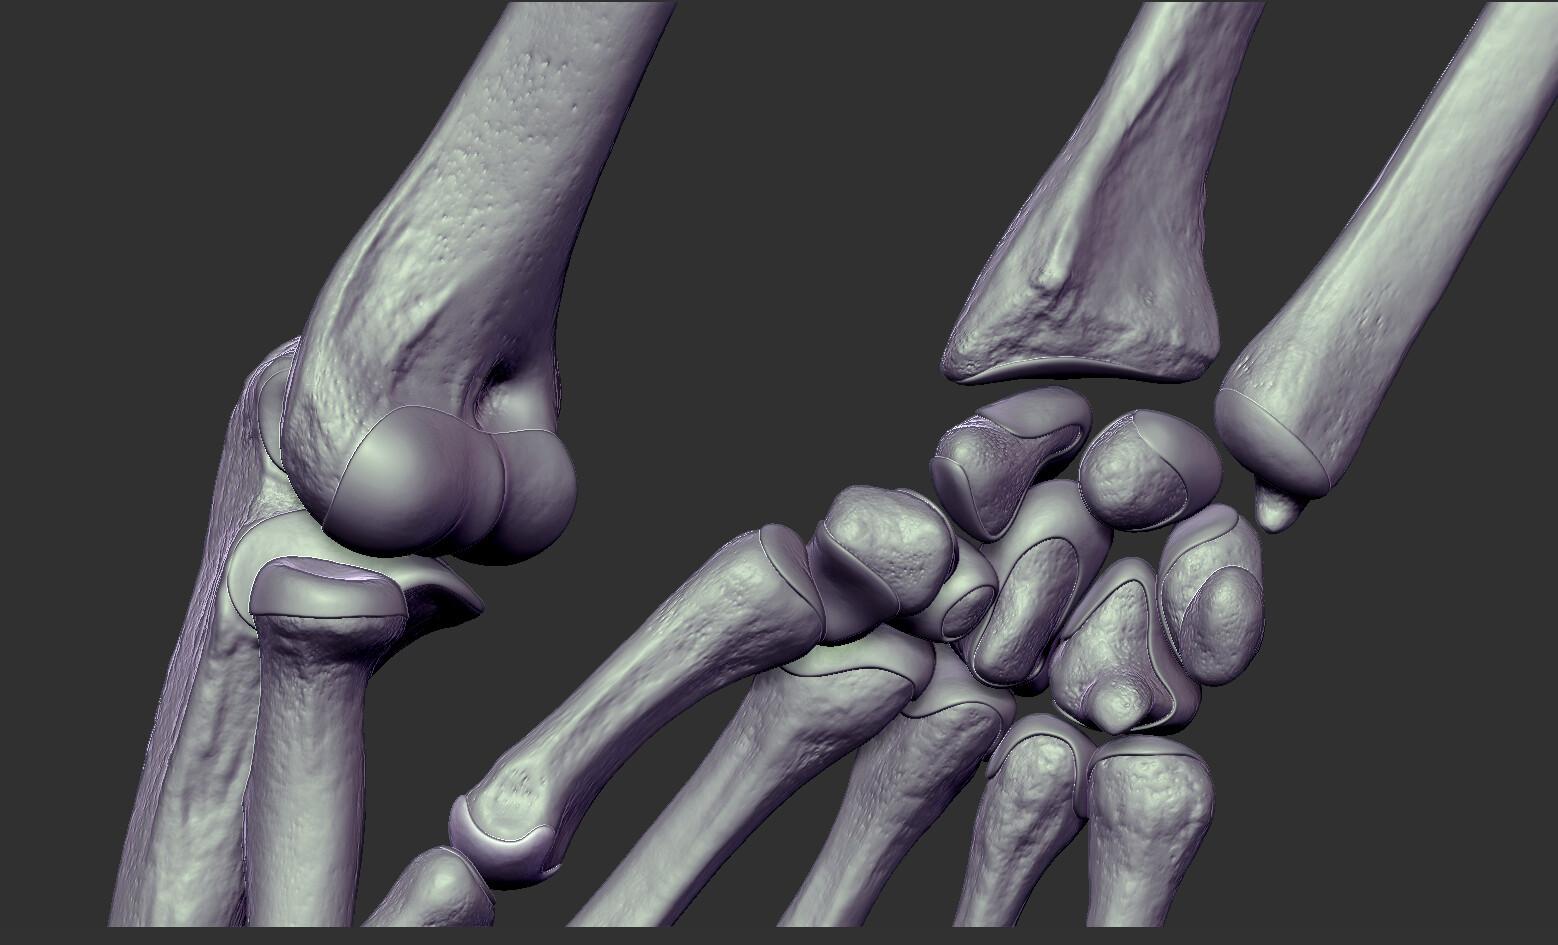 Andrey gritsuk hand 8s